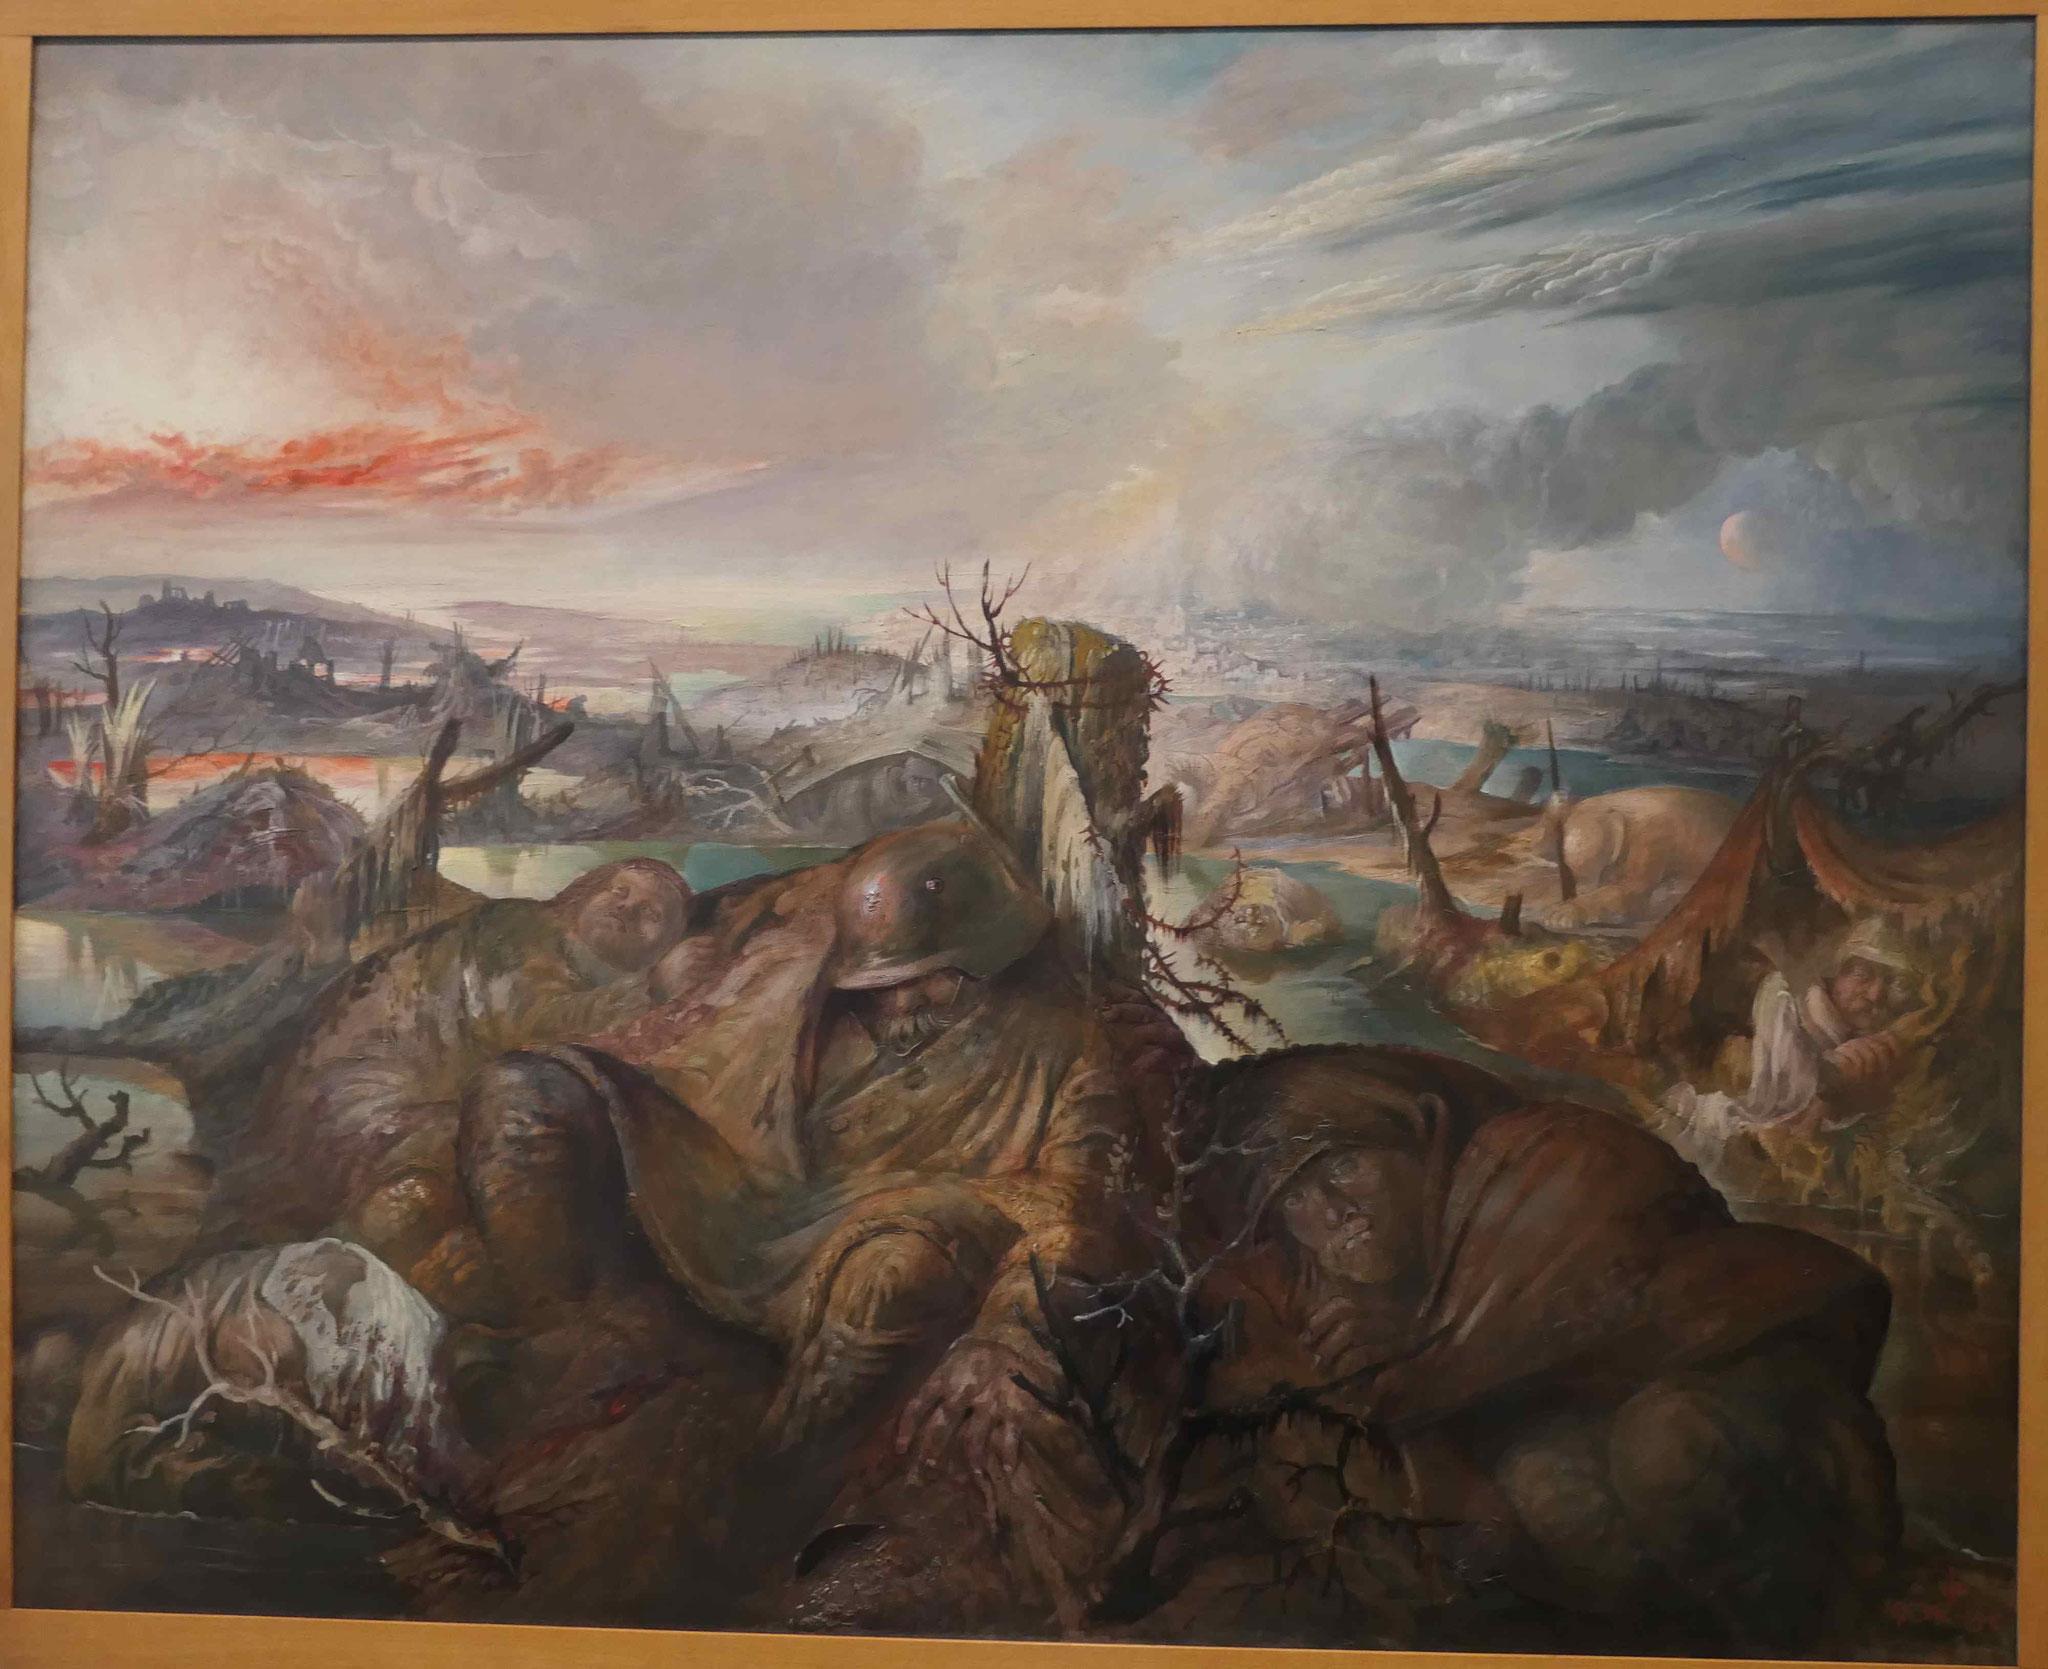 Otto Dix, Flandern, 1934-36, Neue Nationalgalerie Berlin